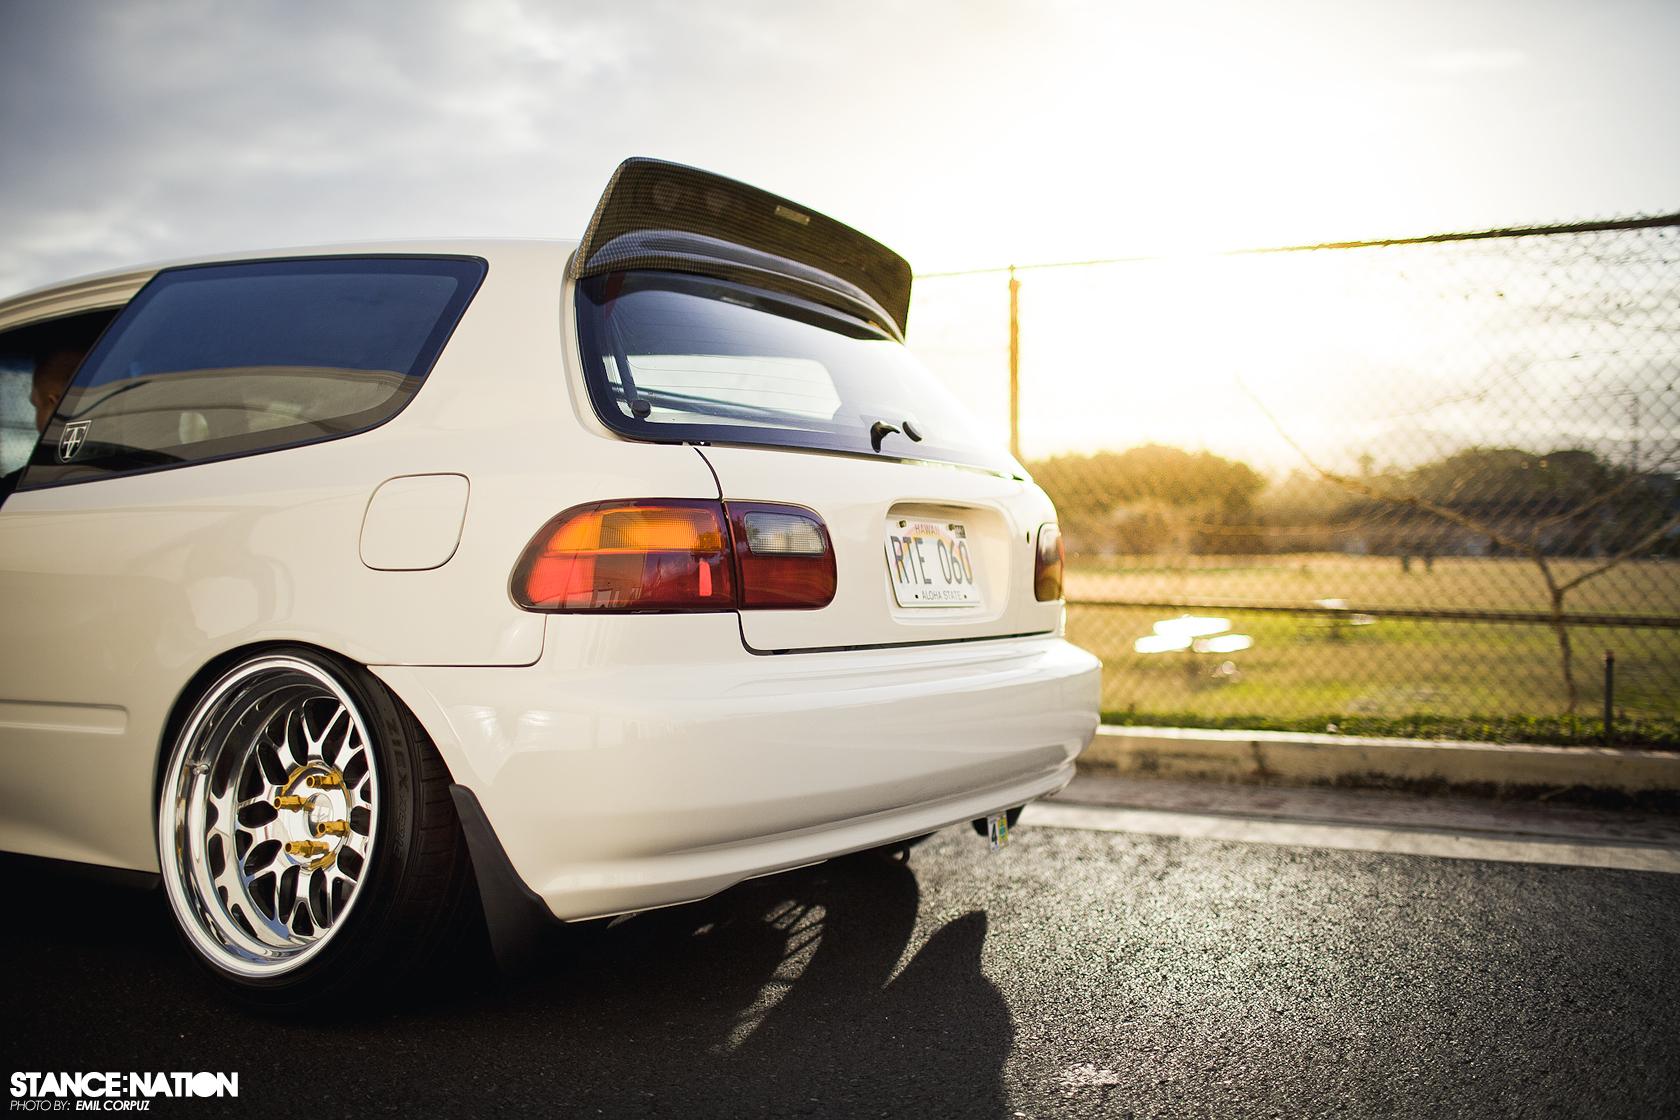 16 Honda Civic Eg Hatch Wallpapers On Wallpapersafari